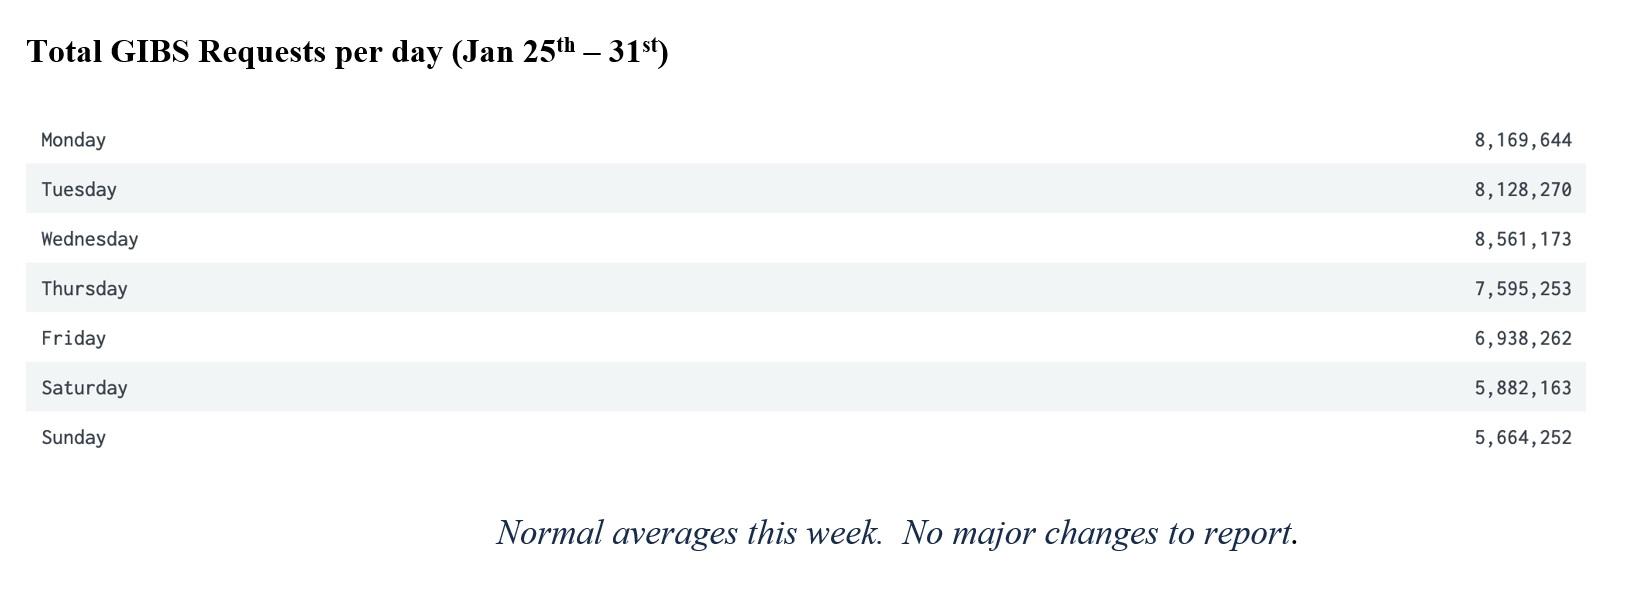 GIBS Metrics 2 1-21-21